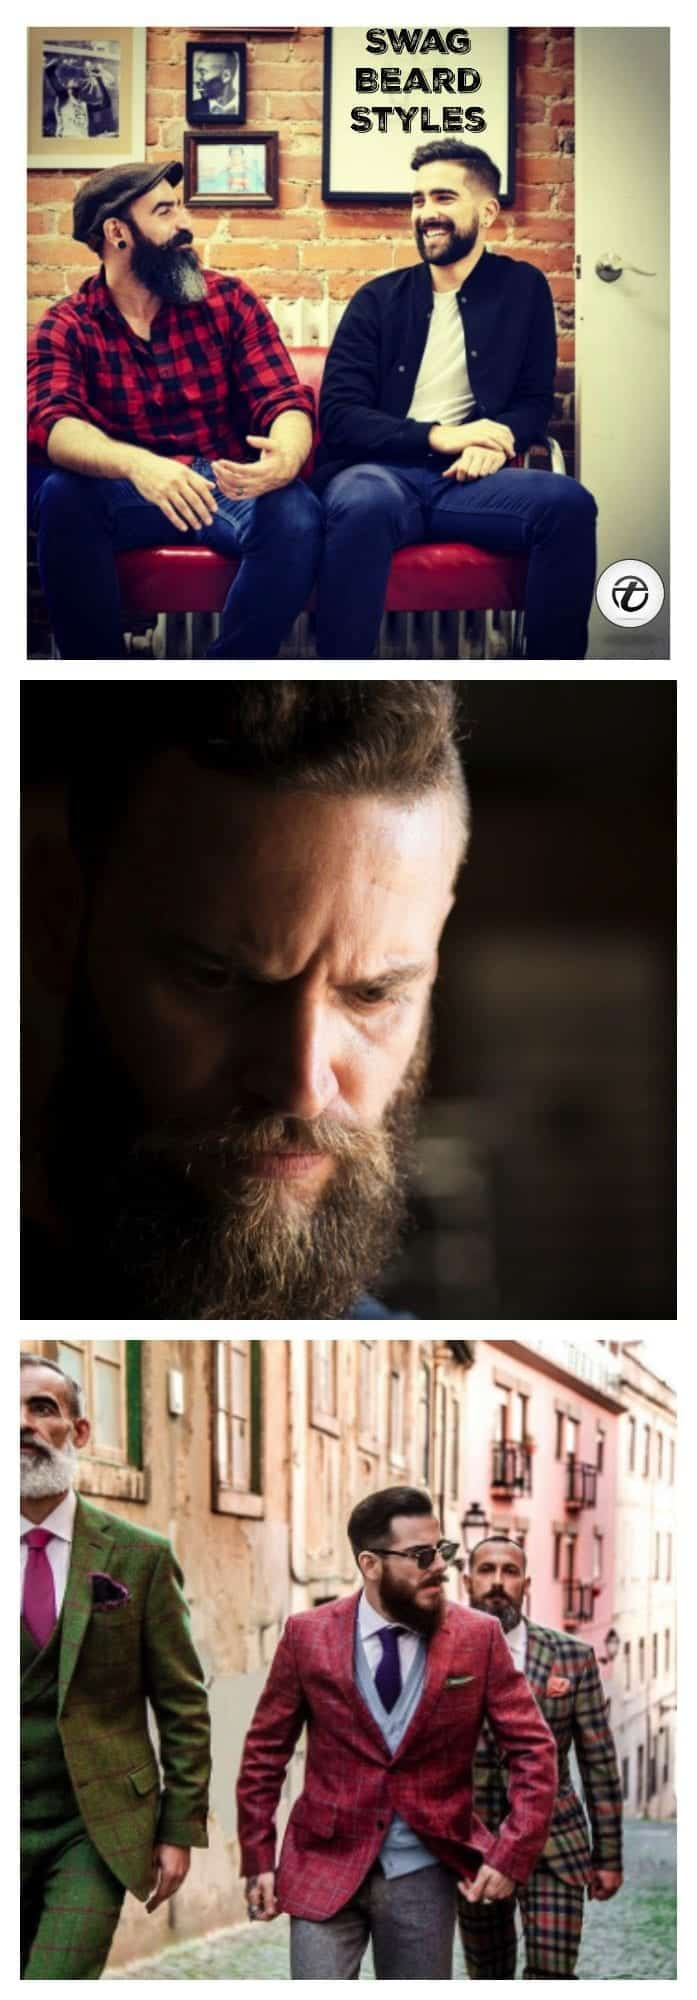 swag-beard-styles Sexy Beard Styles - 50 Latest Beard Styling Ideas for Swag